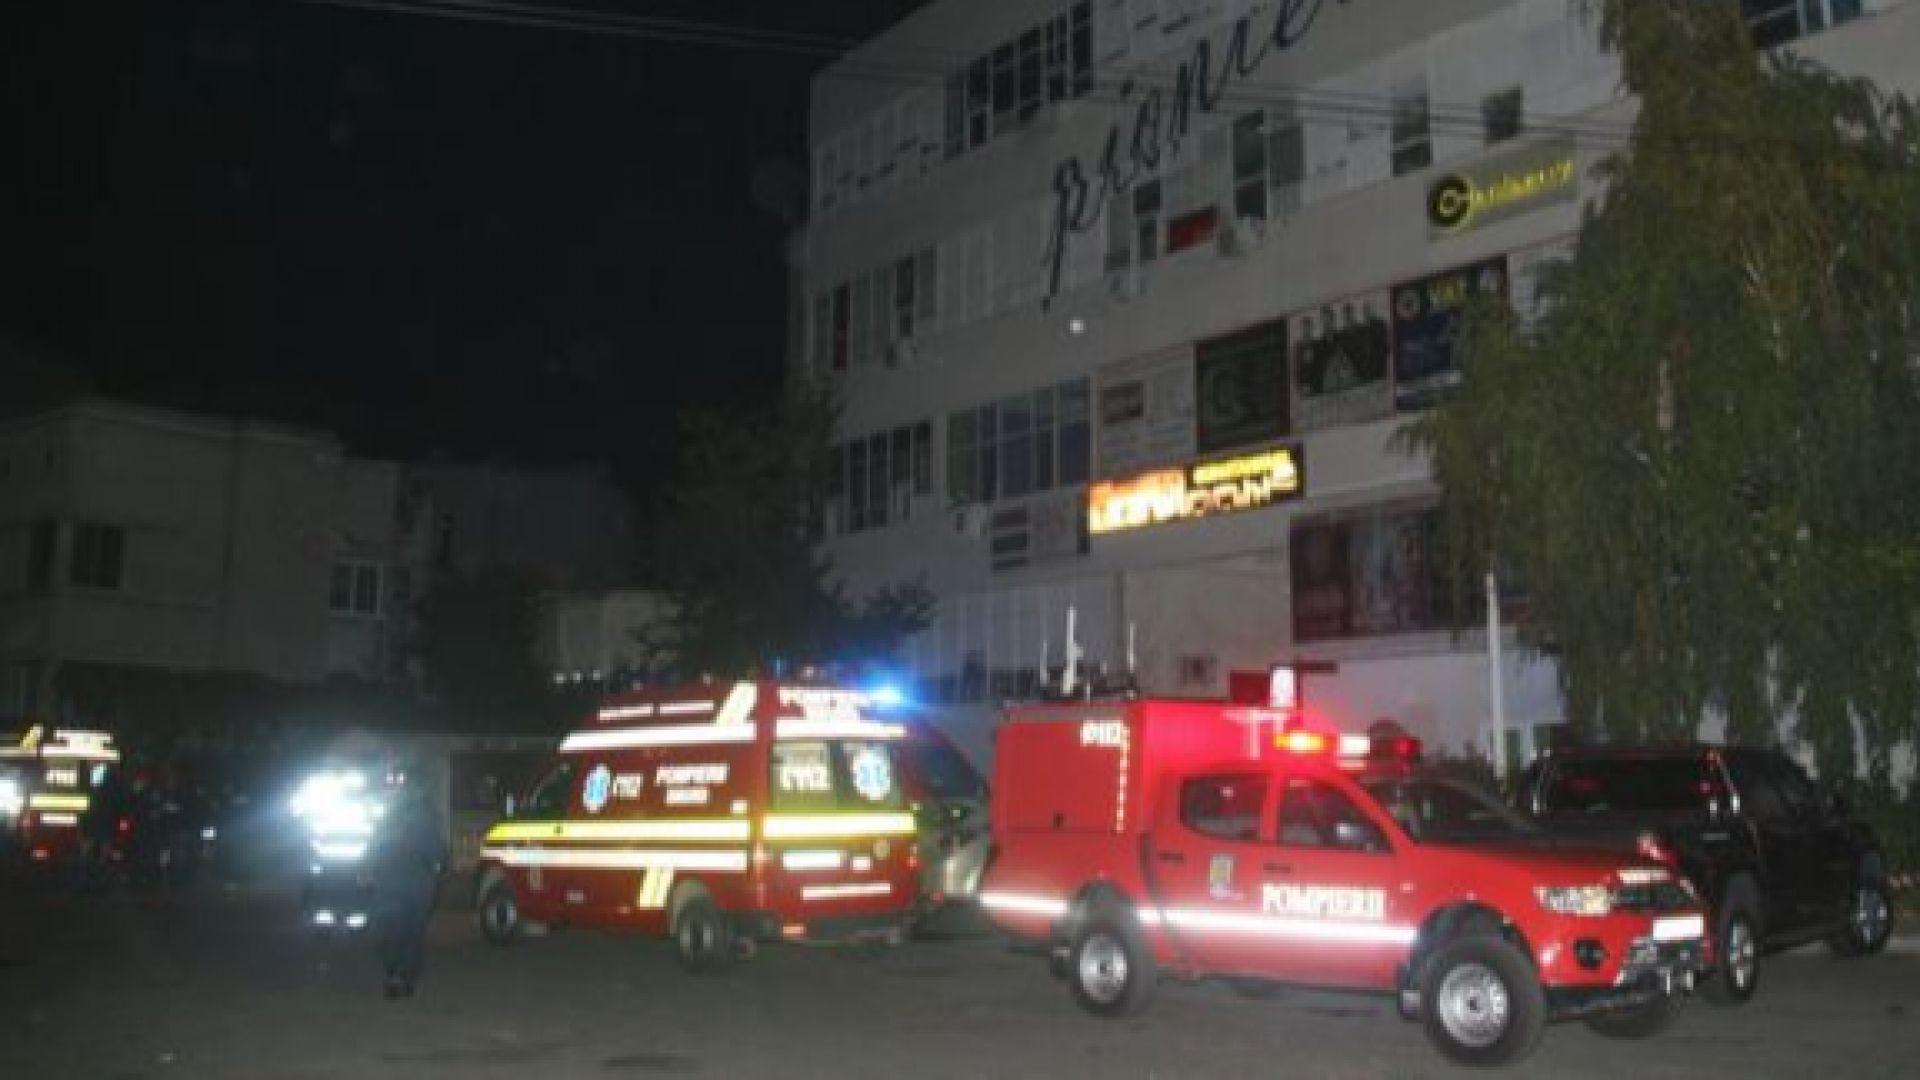 Шестима души са леко пострадали при пожар в мол в Букурещ